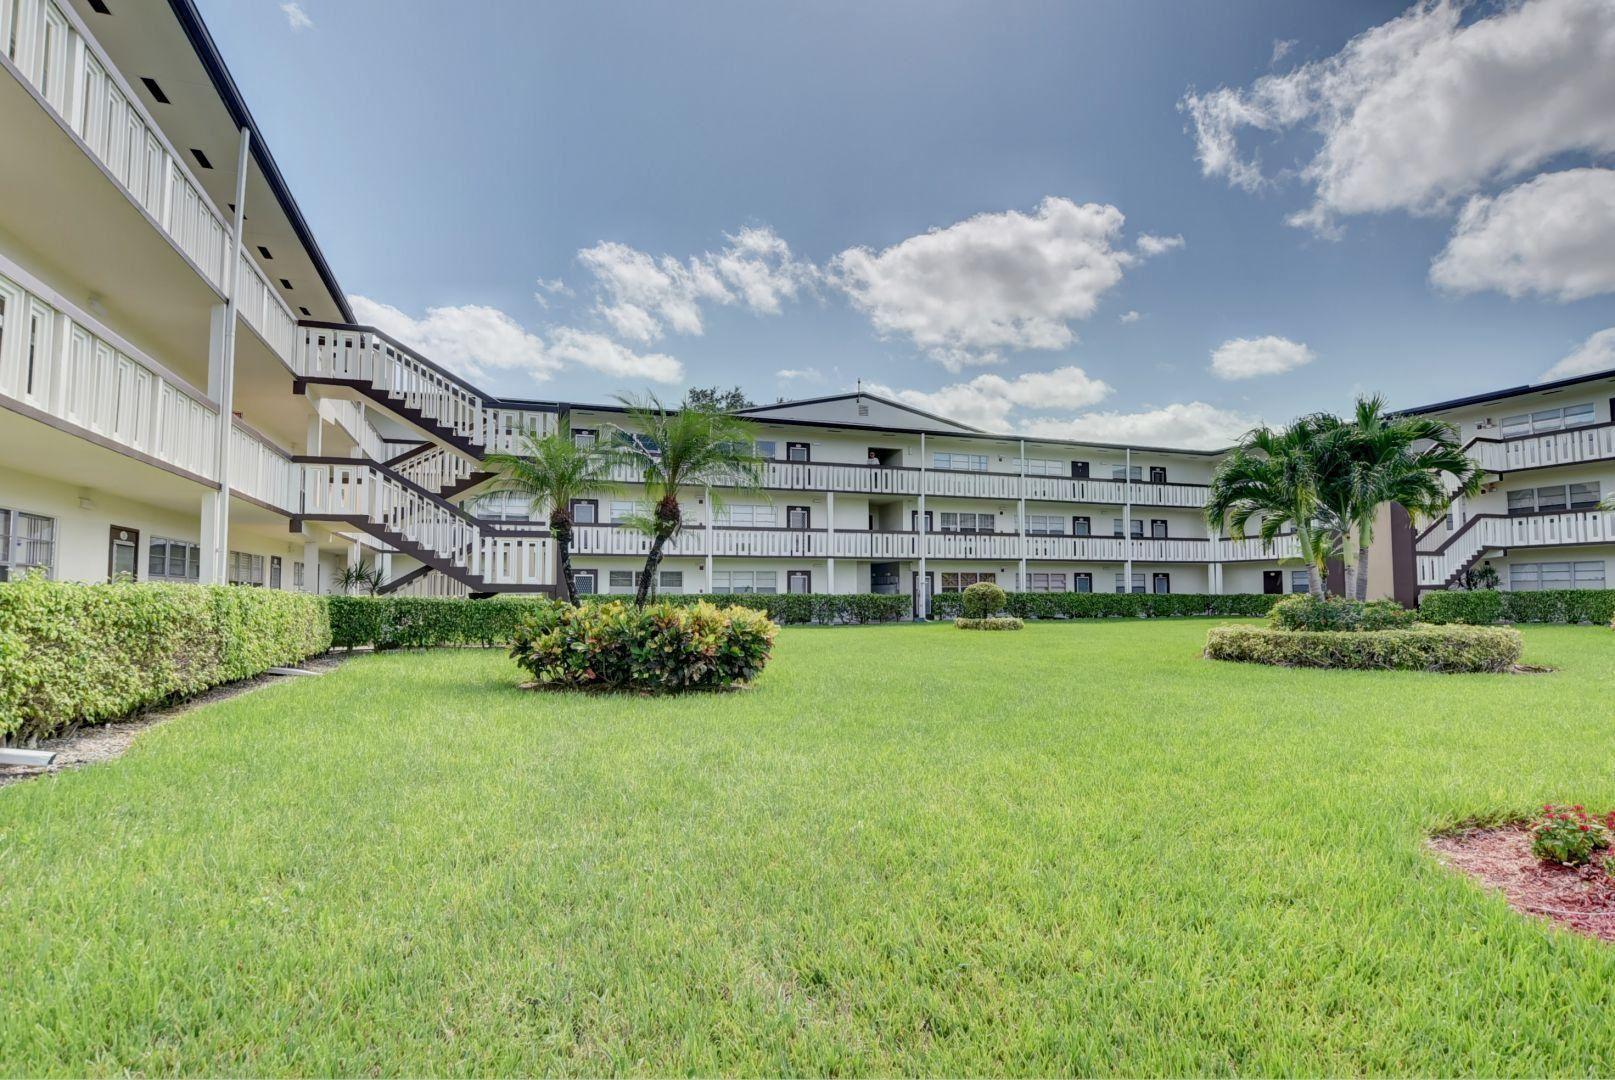 141 Suffolk D #141, Boca Raton, FL 33434 - #: RX-10671258